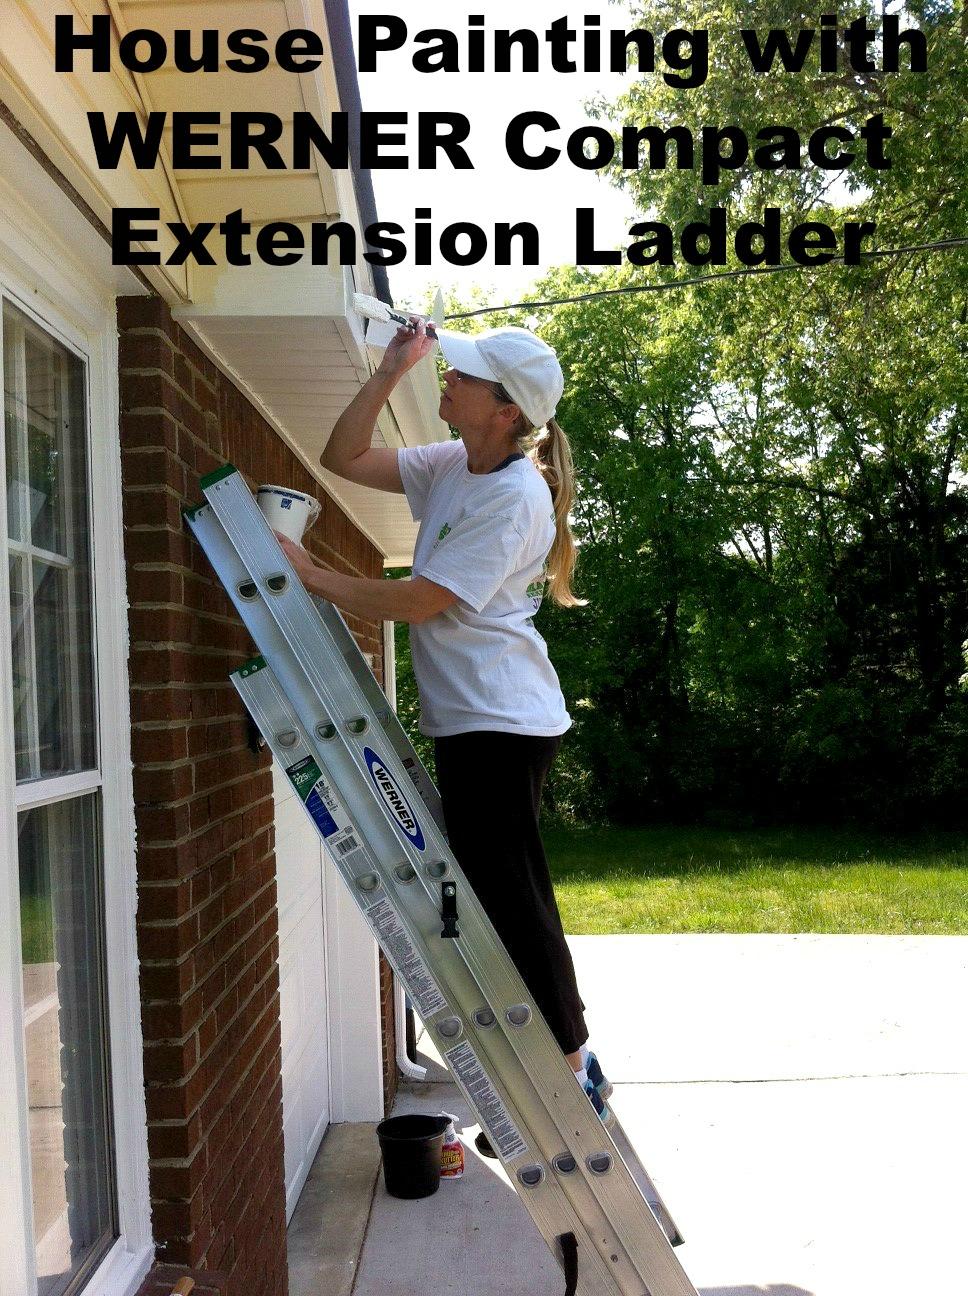 painting house ladder : h4ufc78h.dpwhh.com.